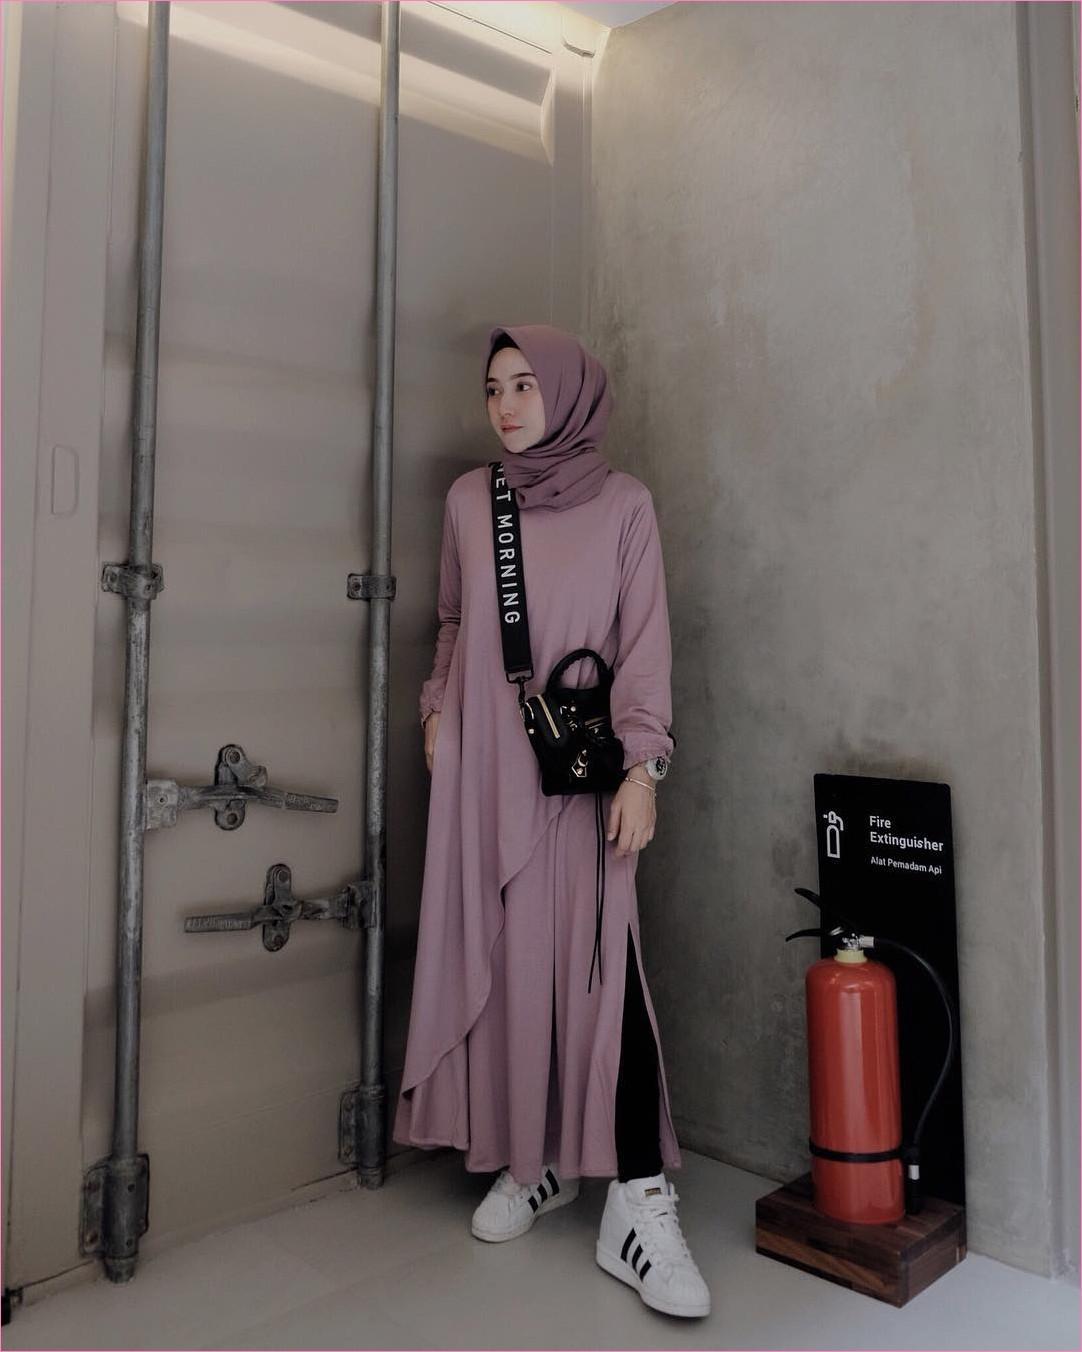 Outfit Baju Hijab Casual Untuk Kuliah Ala Selebgram 2018 tunic abaya ungu muda square hijab kerudung segiempat ungu tua ciput rajut legging handbags hitam jam tangan kotak gelang emas sneakers kets putih adidas gaya casual kain sutra katun rayon ootd 2018 selebgram outfit tembok